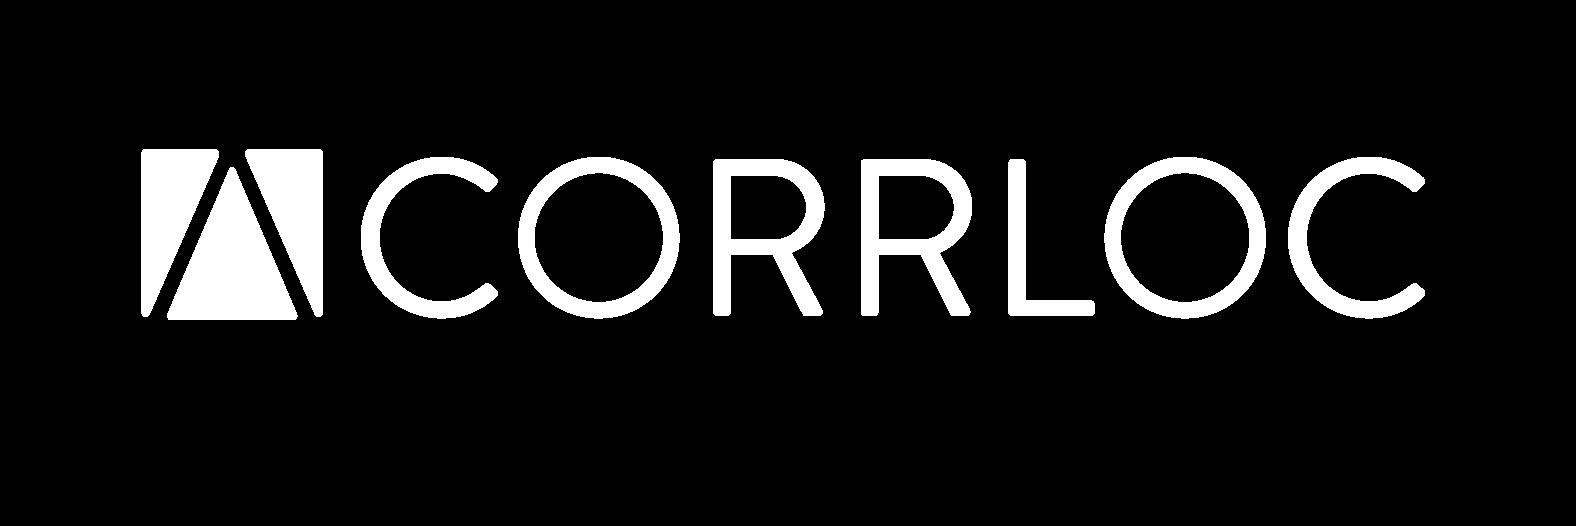 http://corrloc.com/wp-content/uploads/2018/02/cropped-corrloc-logo-white.png